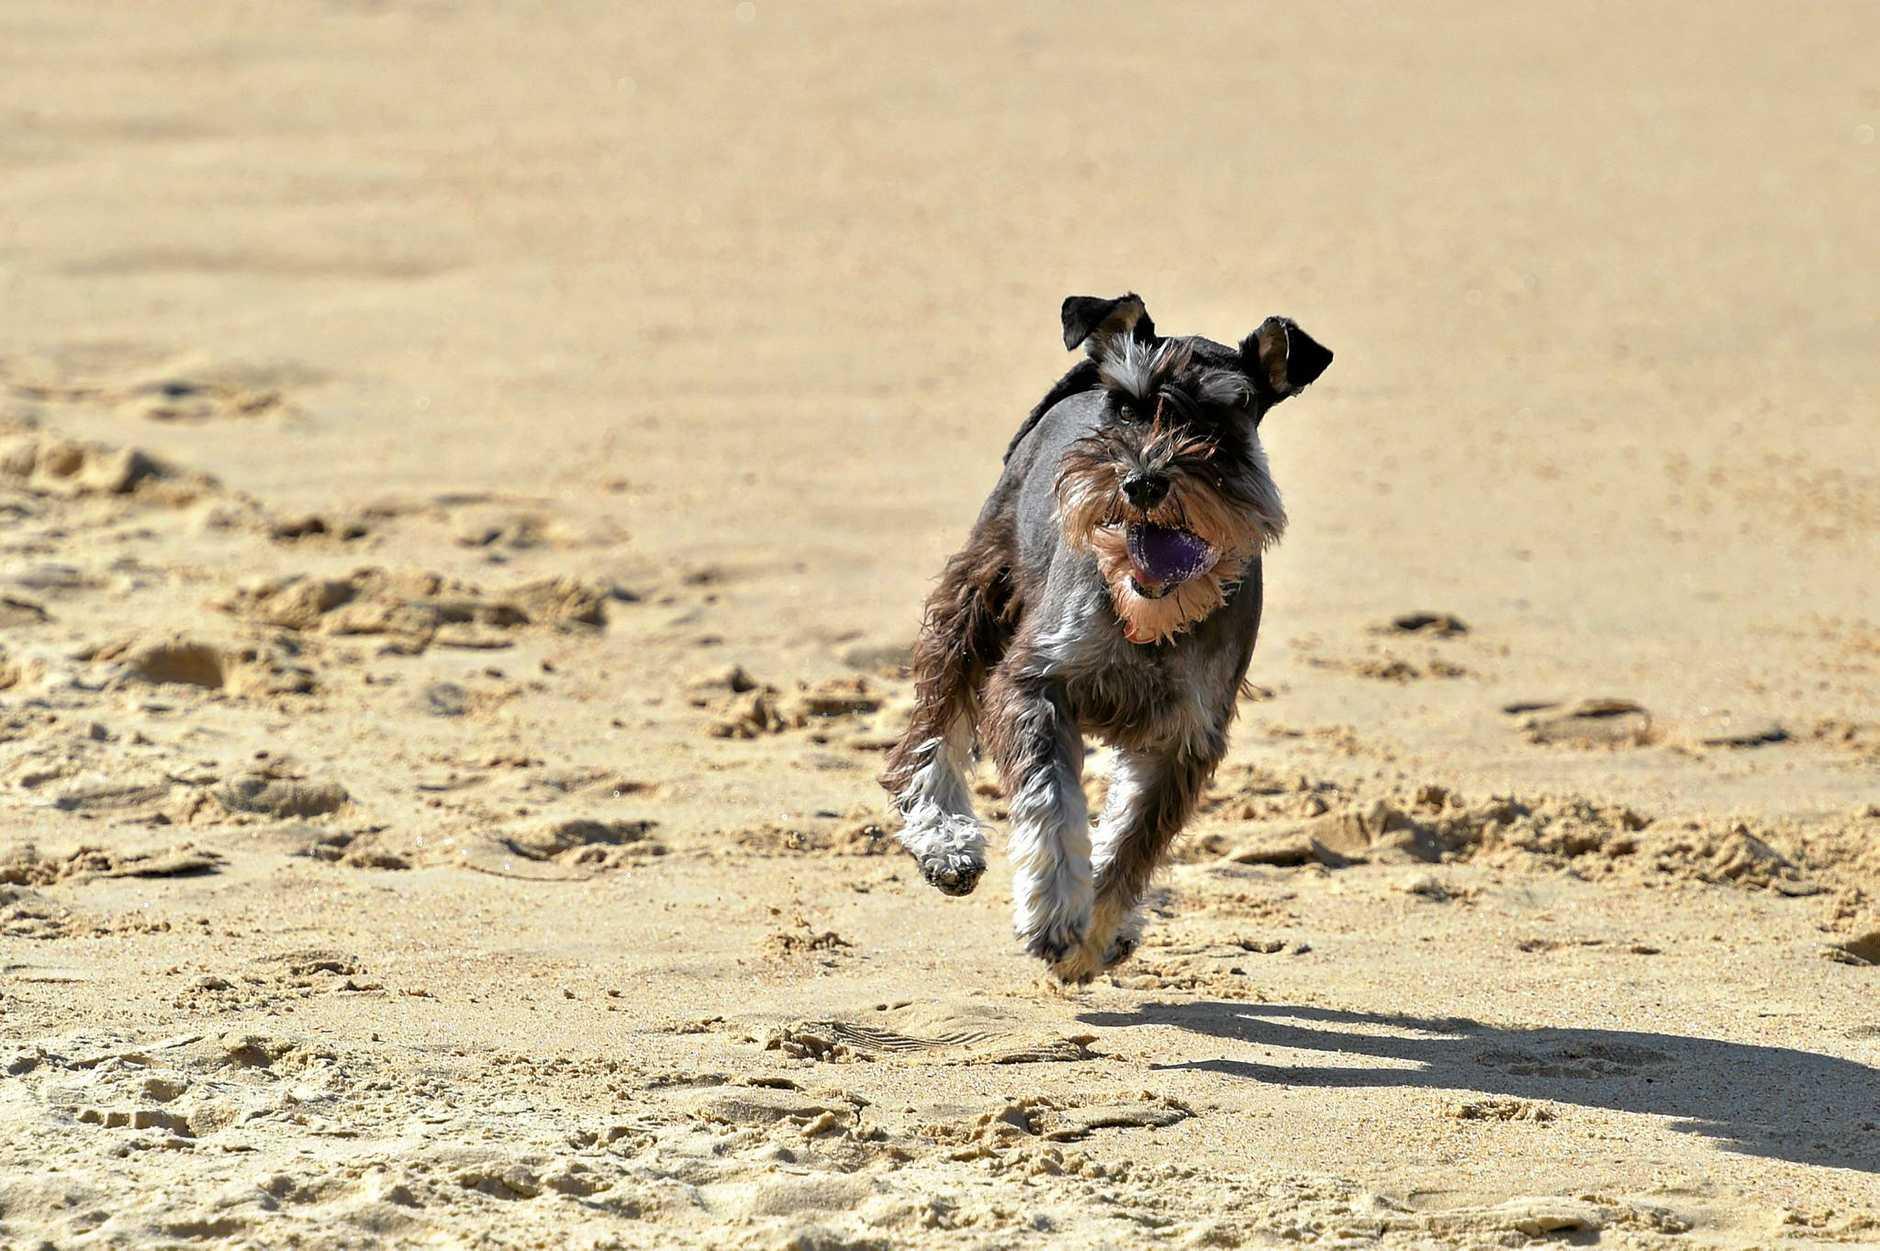 Schnauzer gathering at Currimundi.Dogs play on the beach.